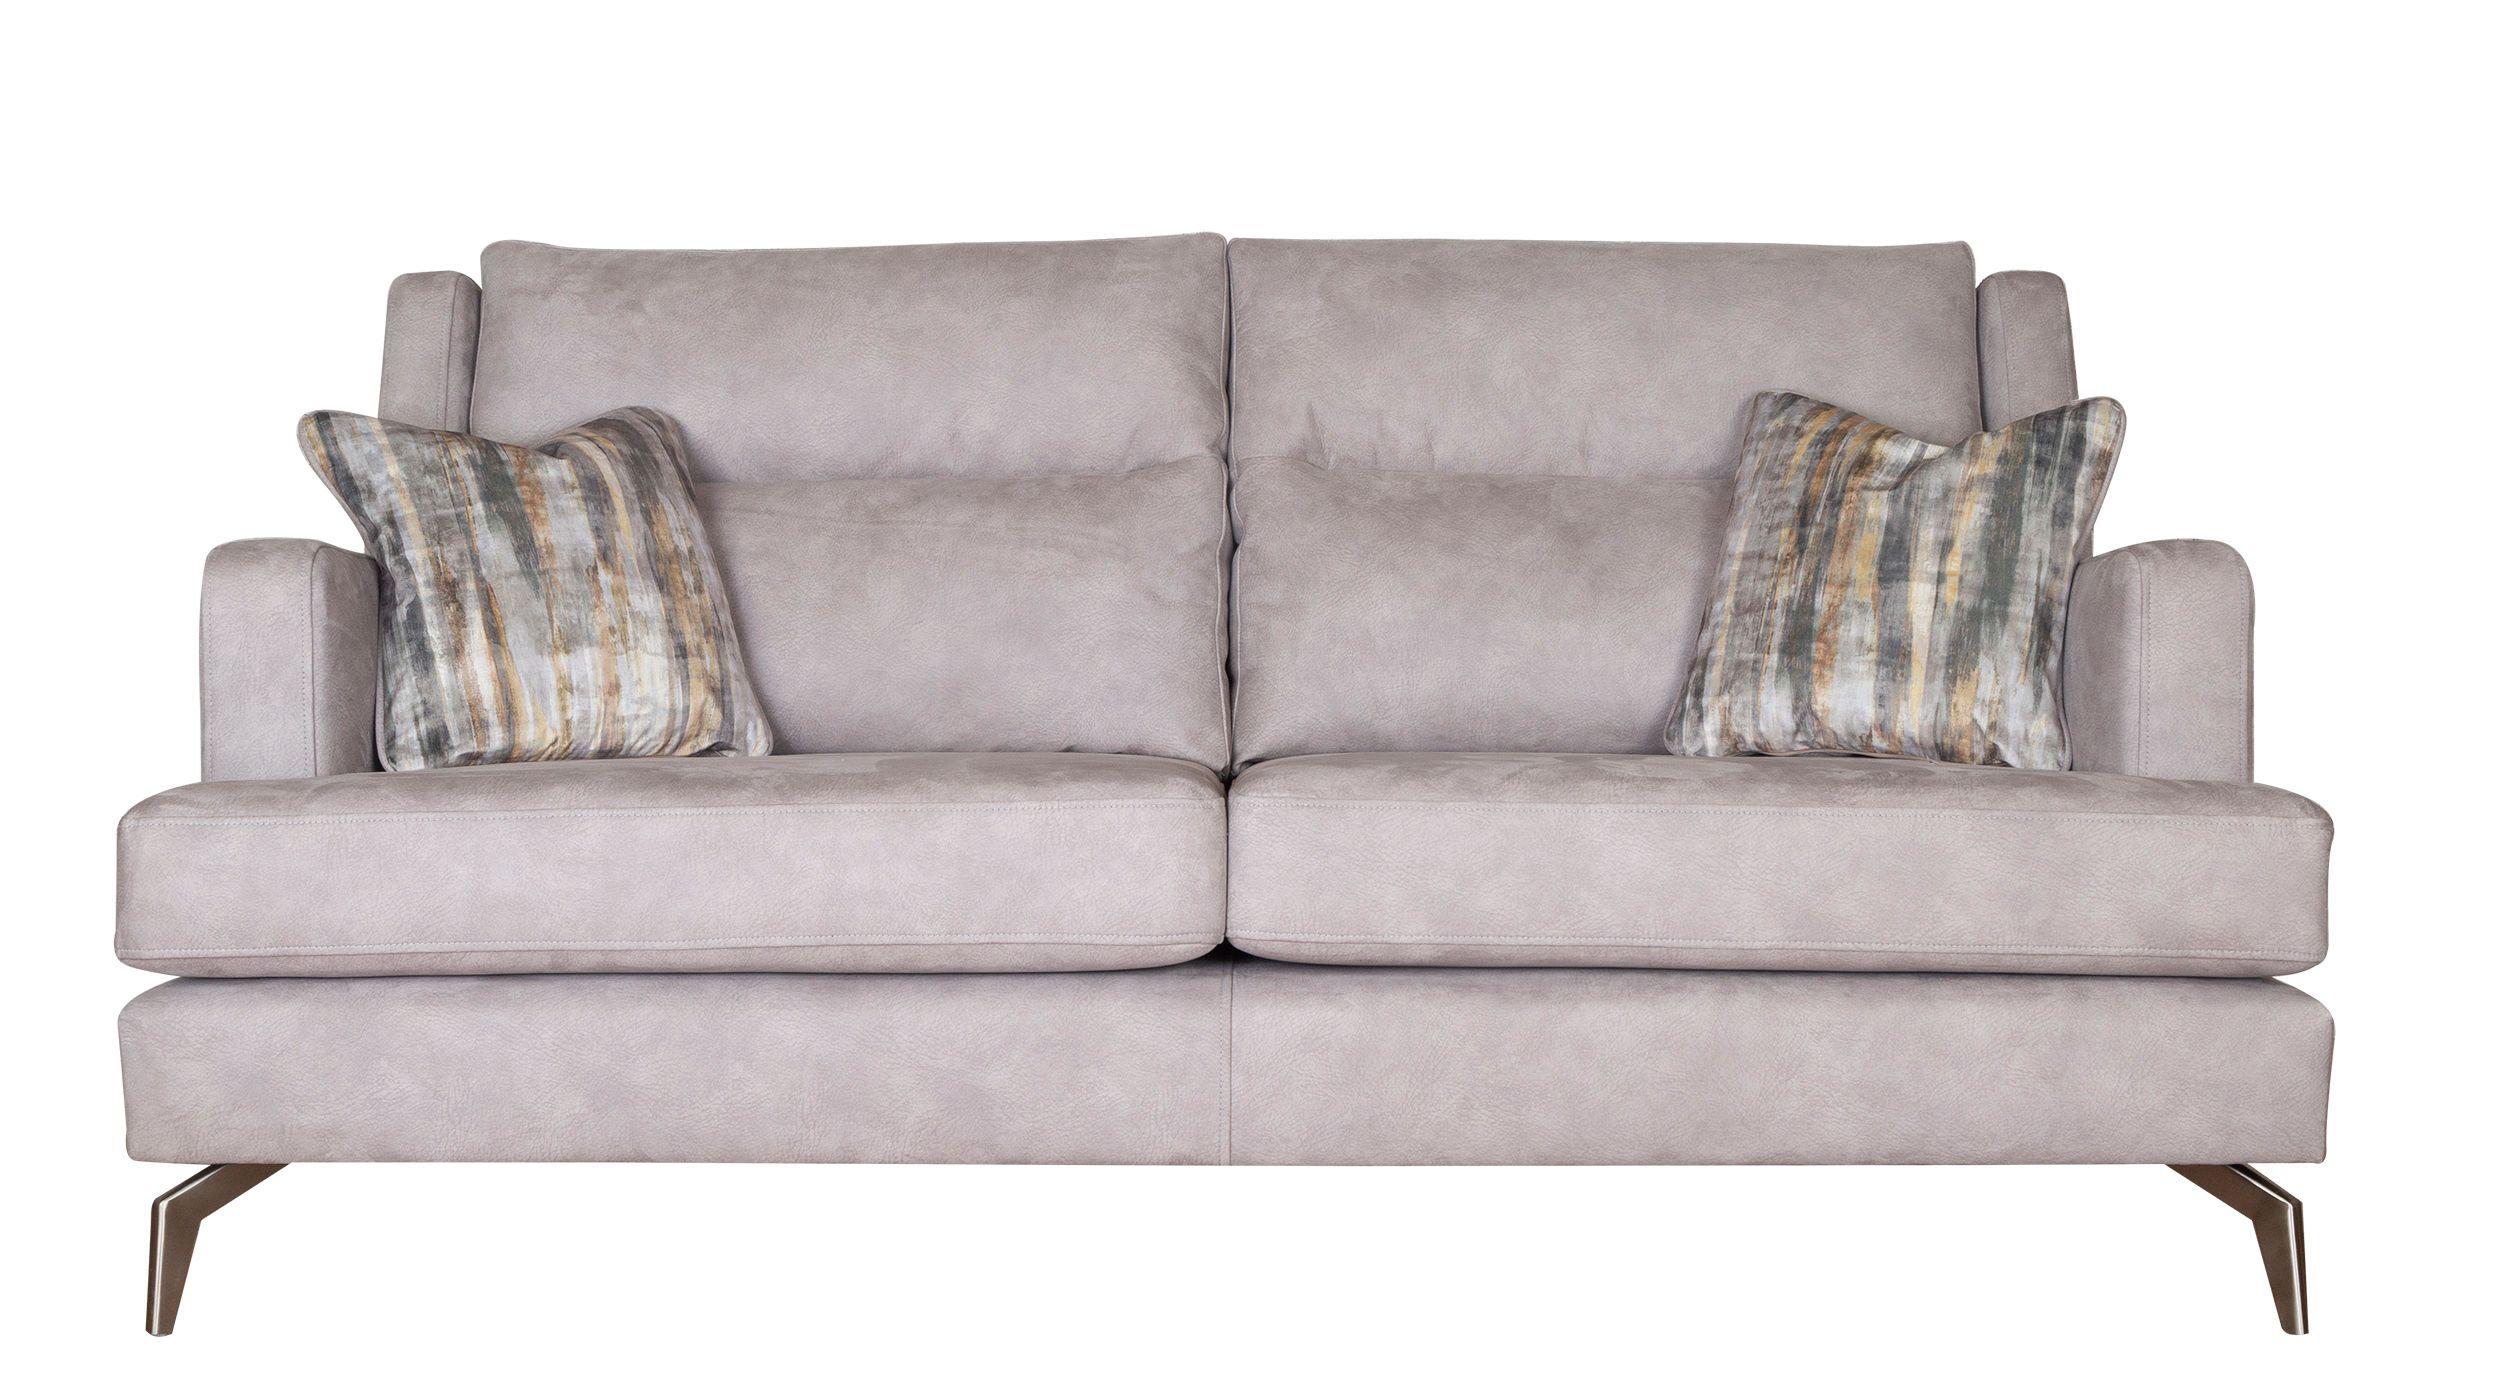 Parker 3 Seater Sofa